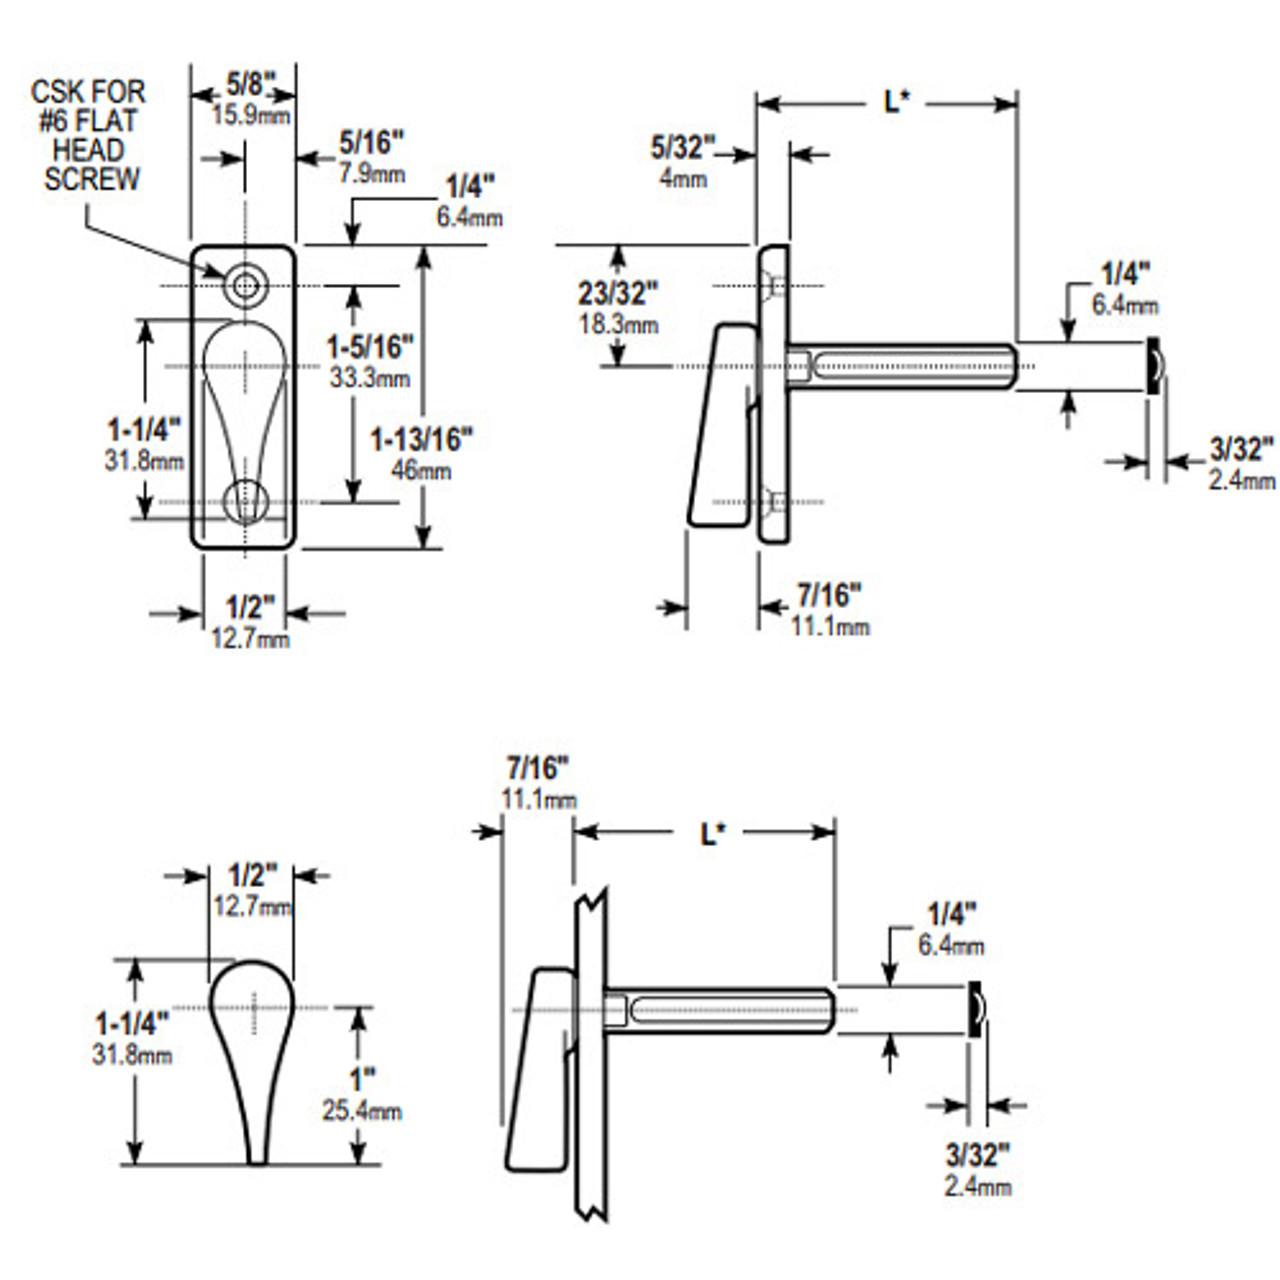 1000-21-12-130 Adams Rite 1000 Series Turns Dimensional View